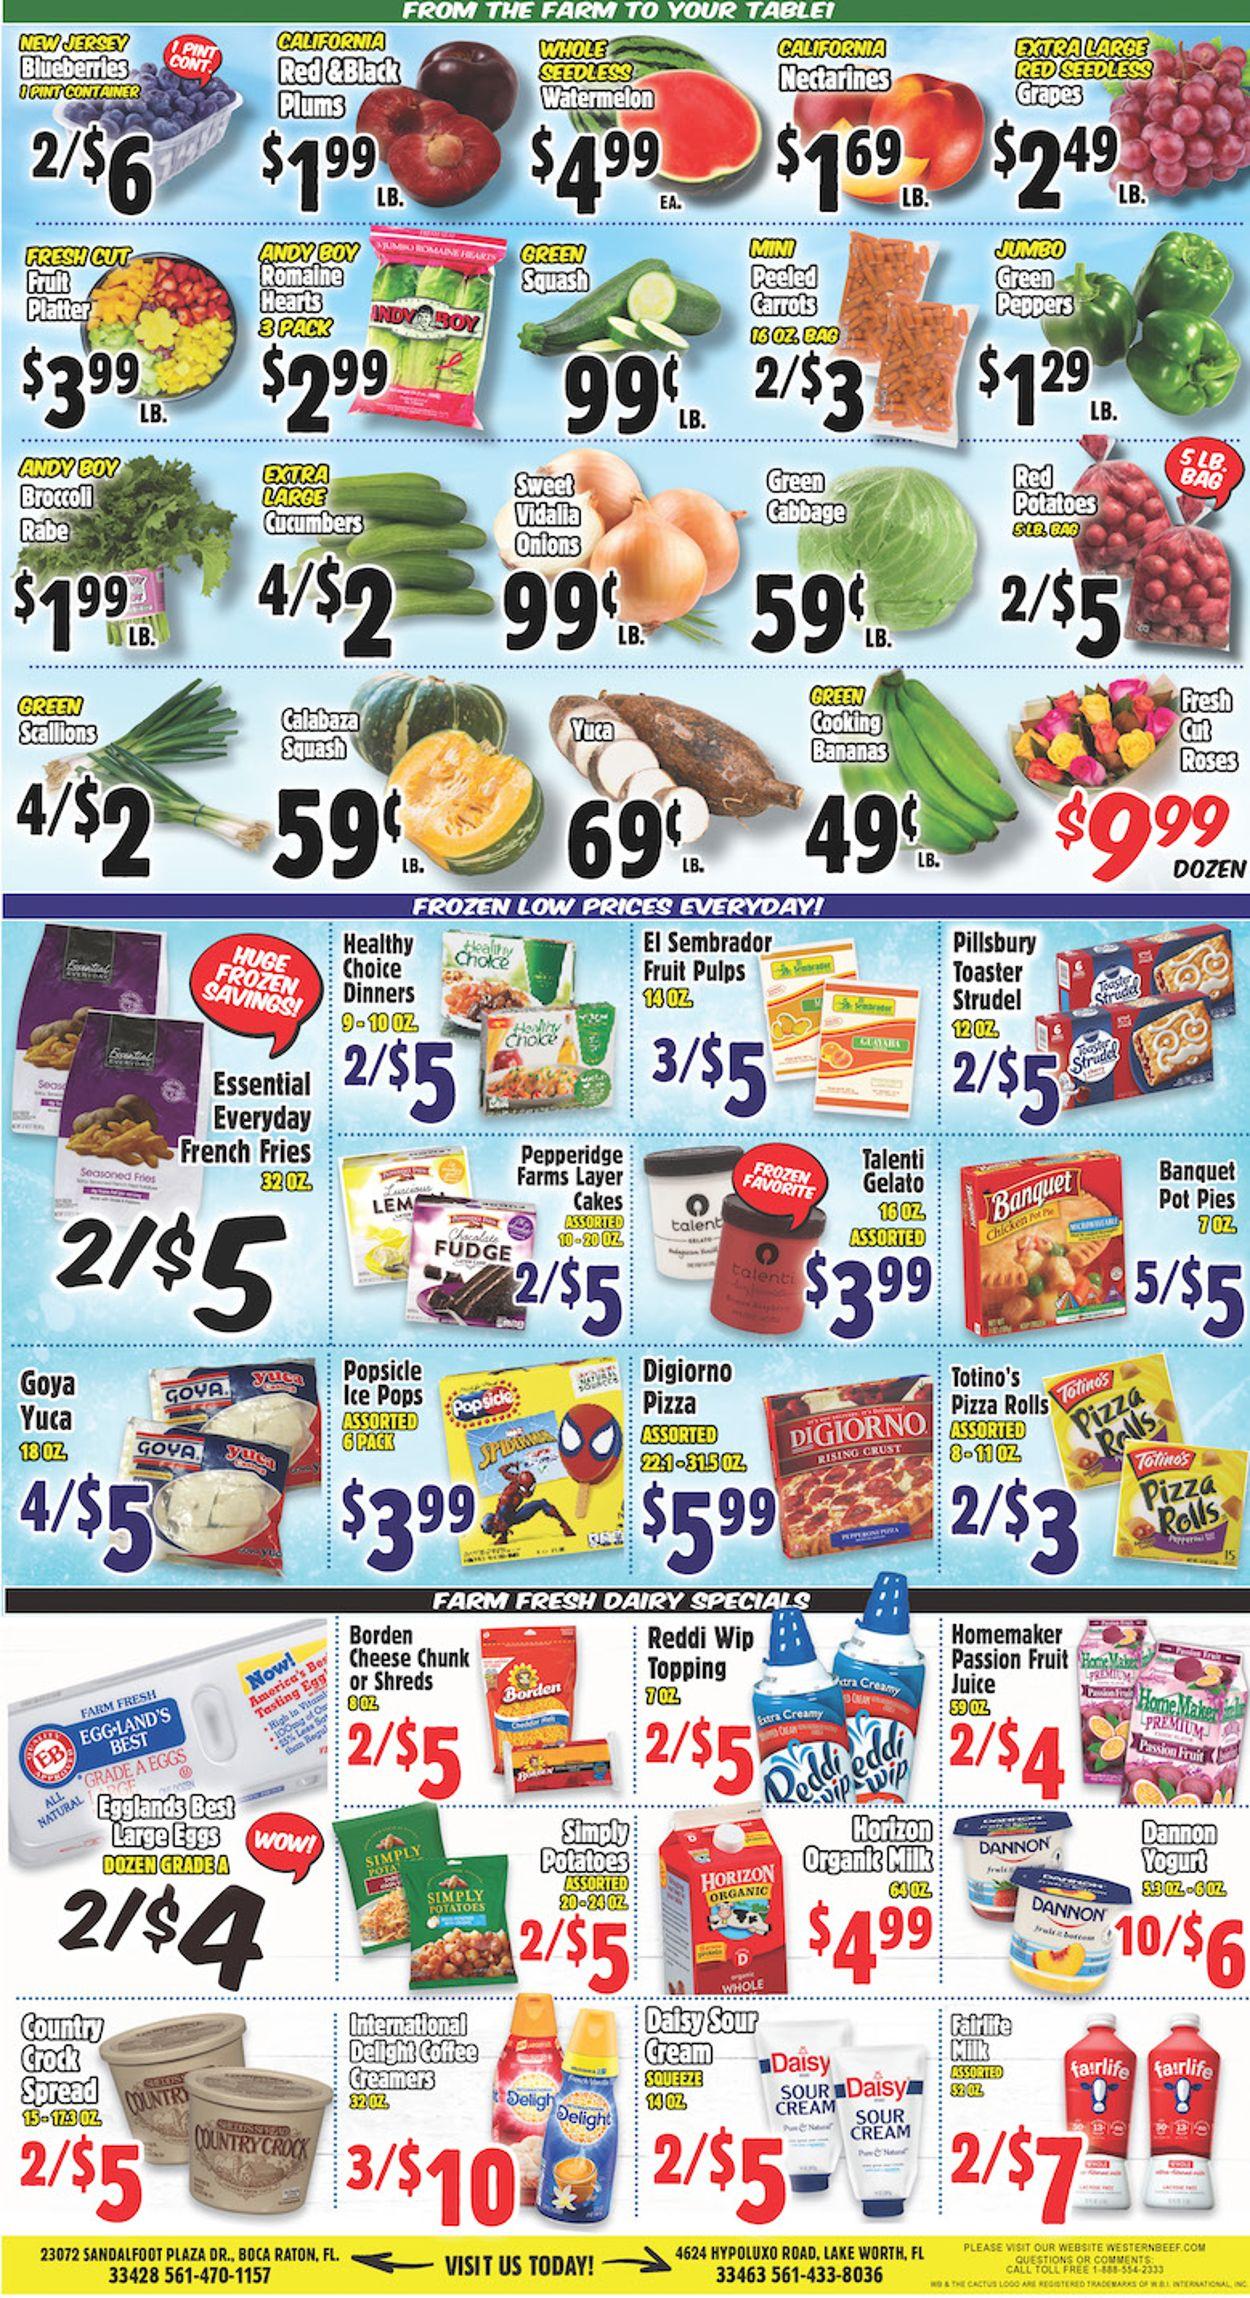 Western Beef Weekly Ad Circular - valid 07/14-07/20/2021 (Page 2)